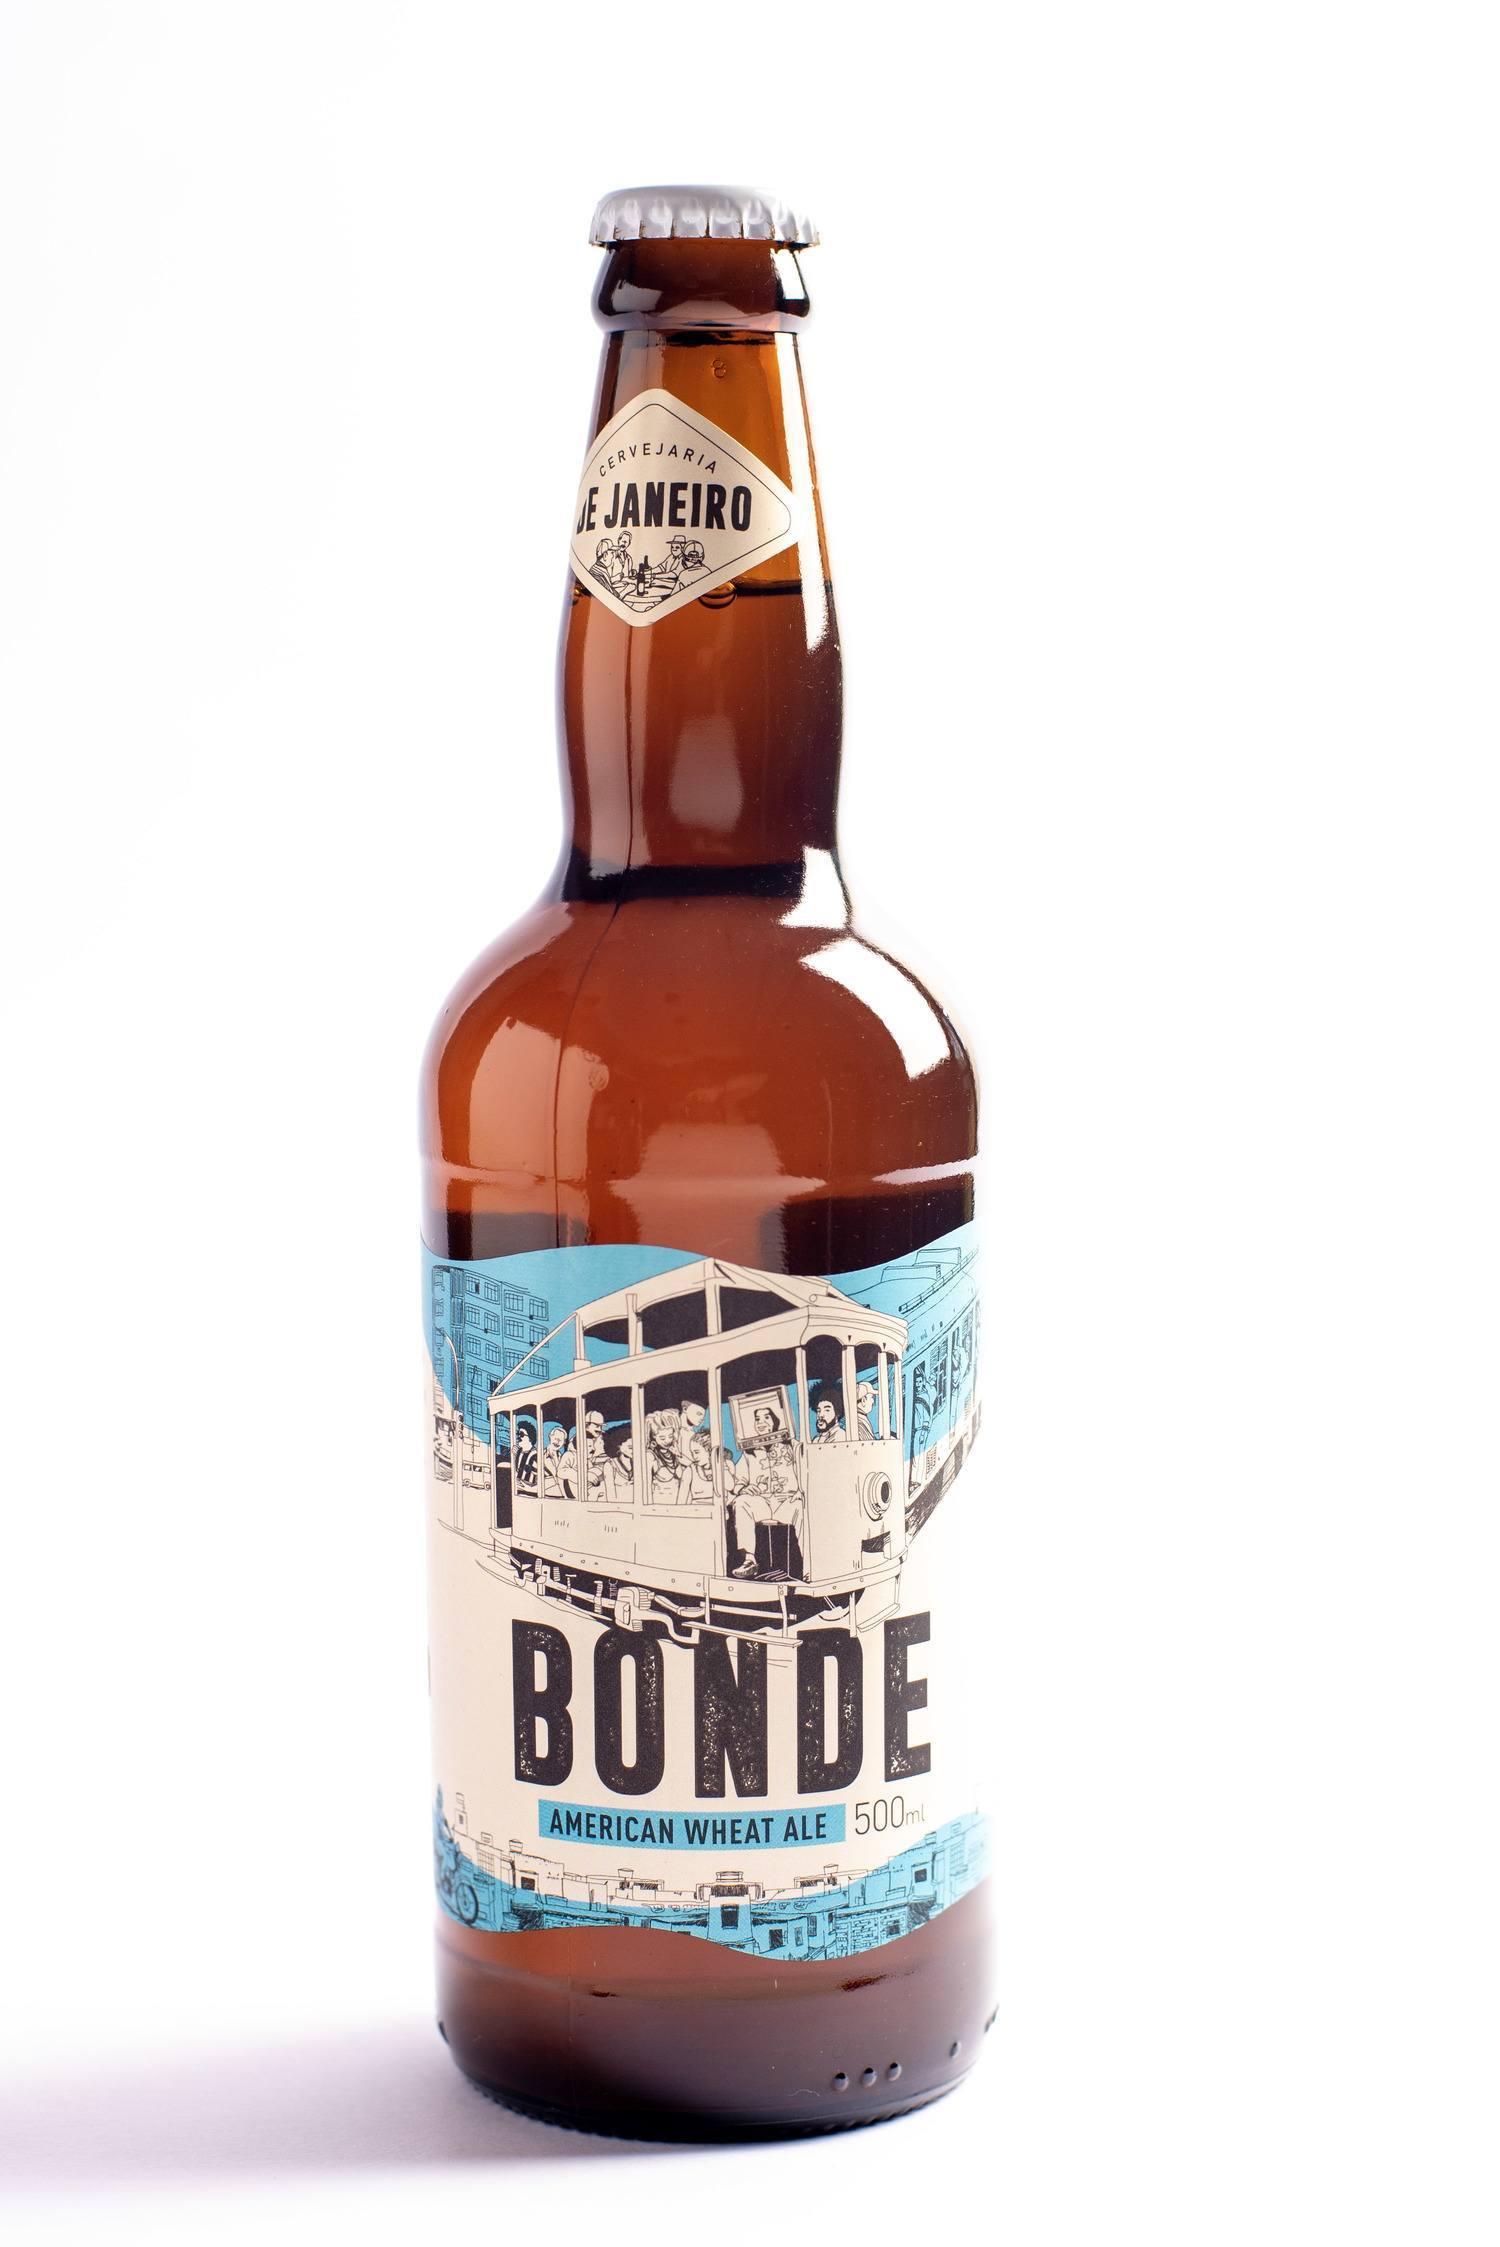 Bonde (American Wheat Ale) - De Janeiro